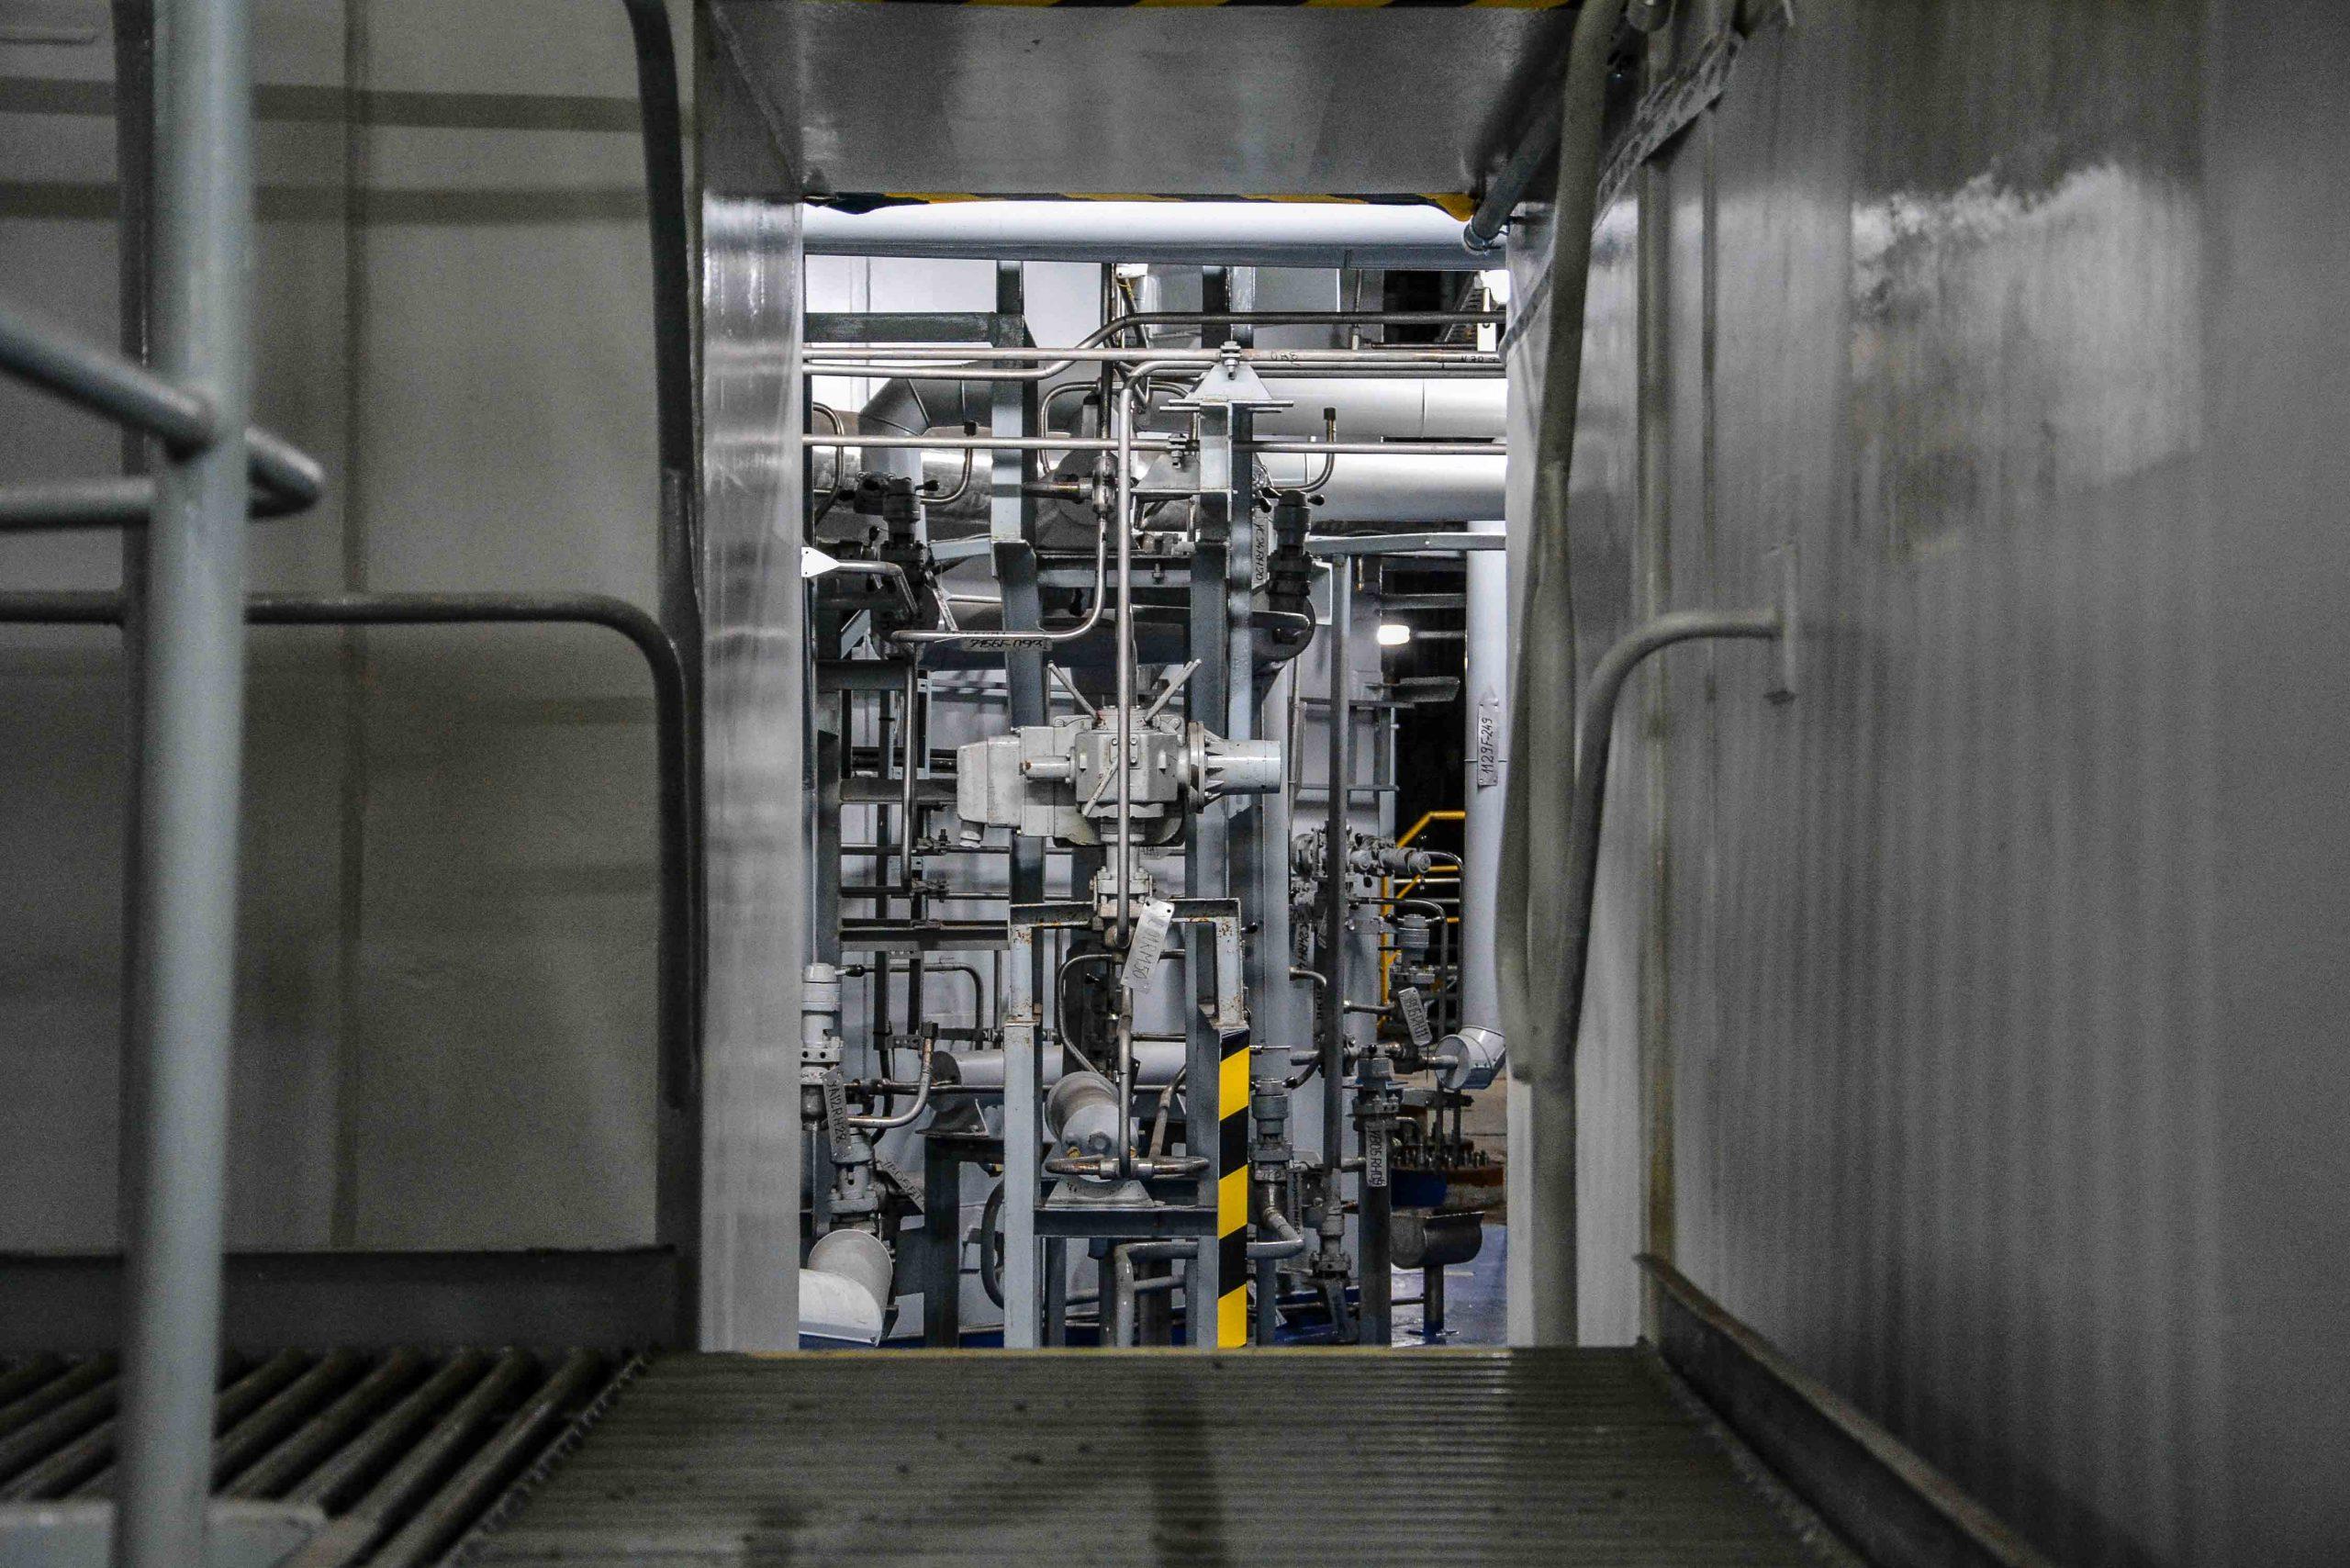 nuklear reaktor leitungen kernkraftwerk greifswald nuclear powerplant ost deutschland east germany gdr DDR mecklenburg vorpommern